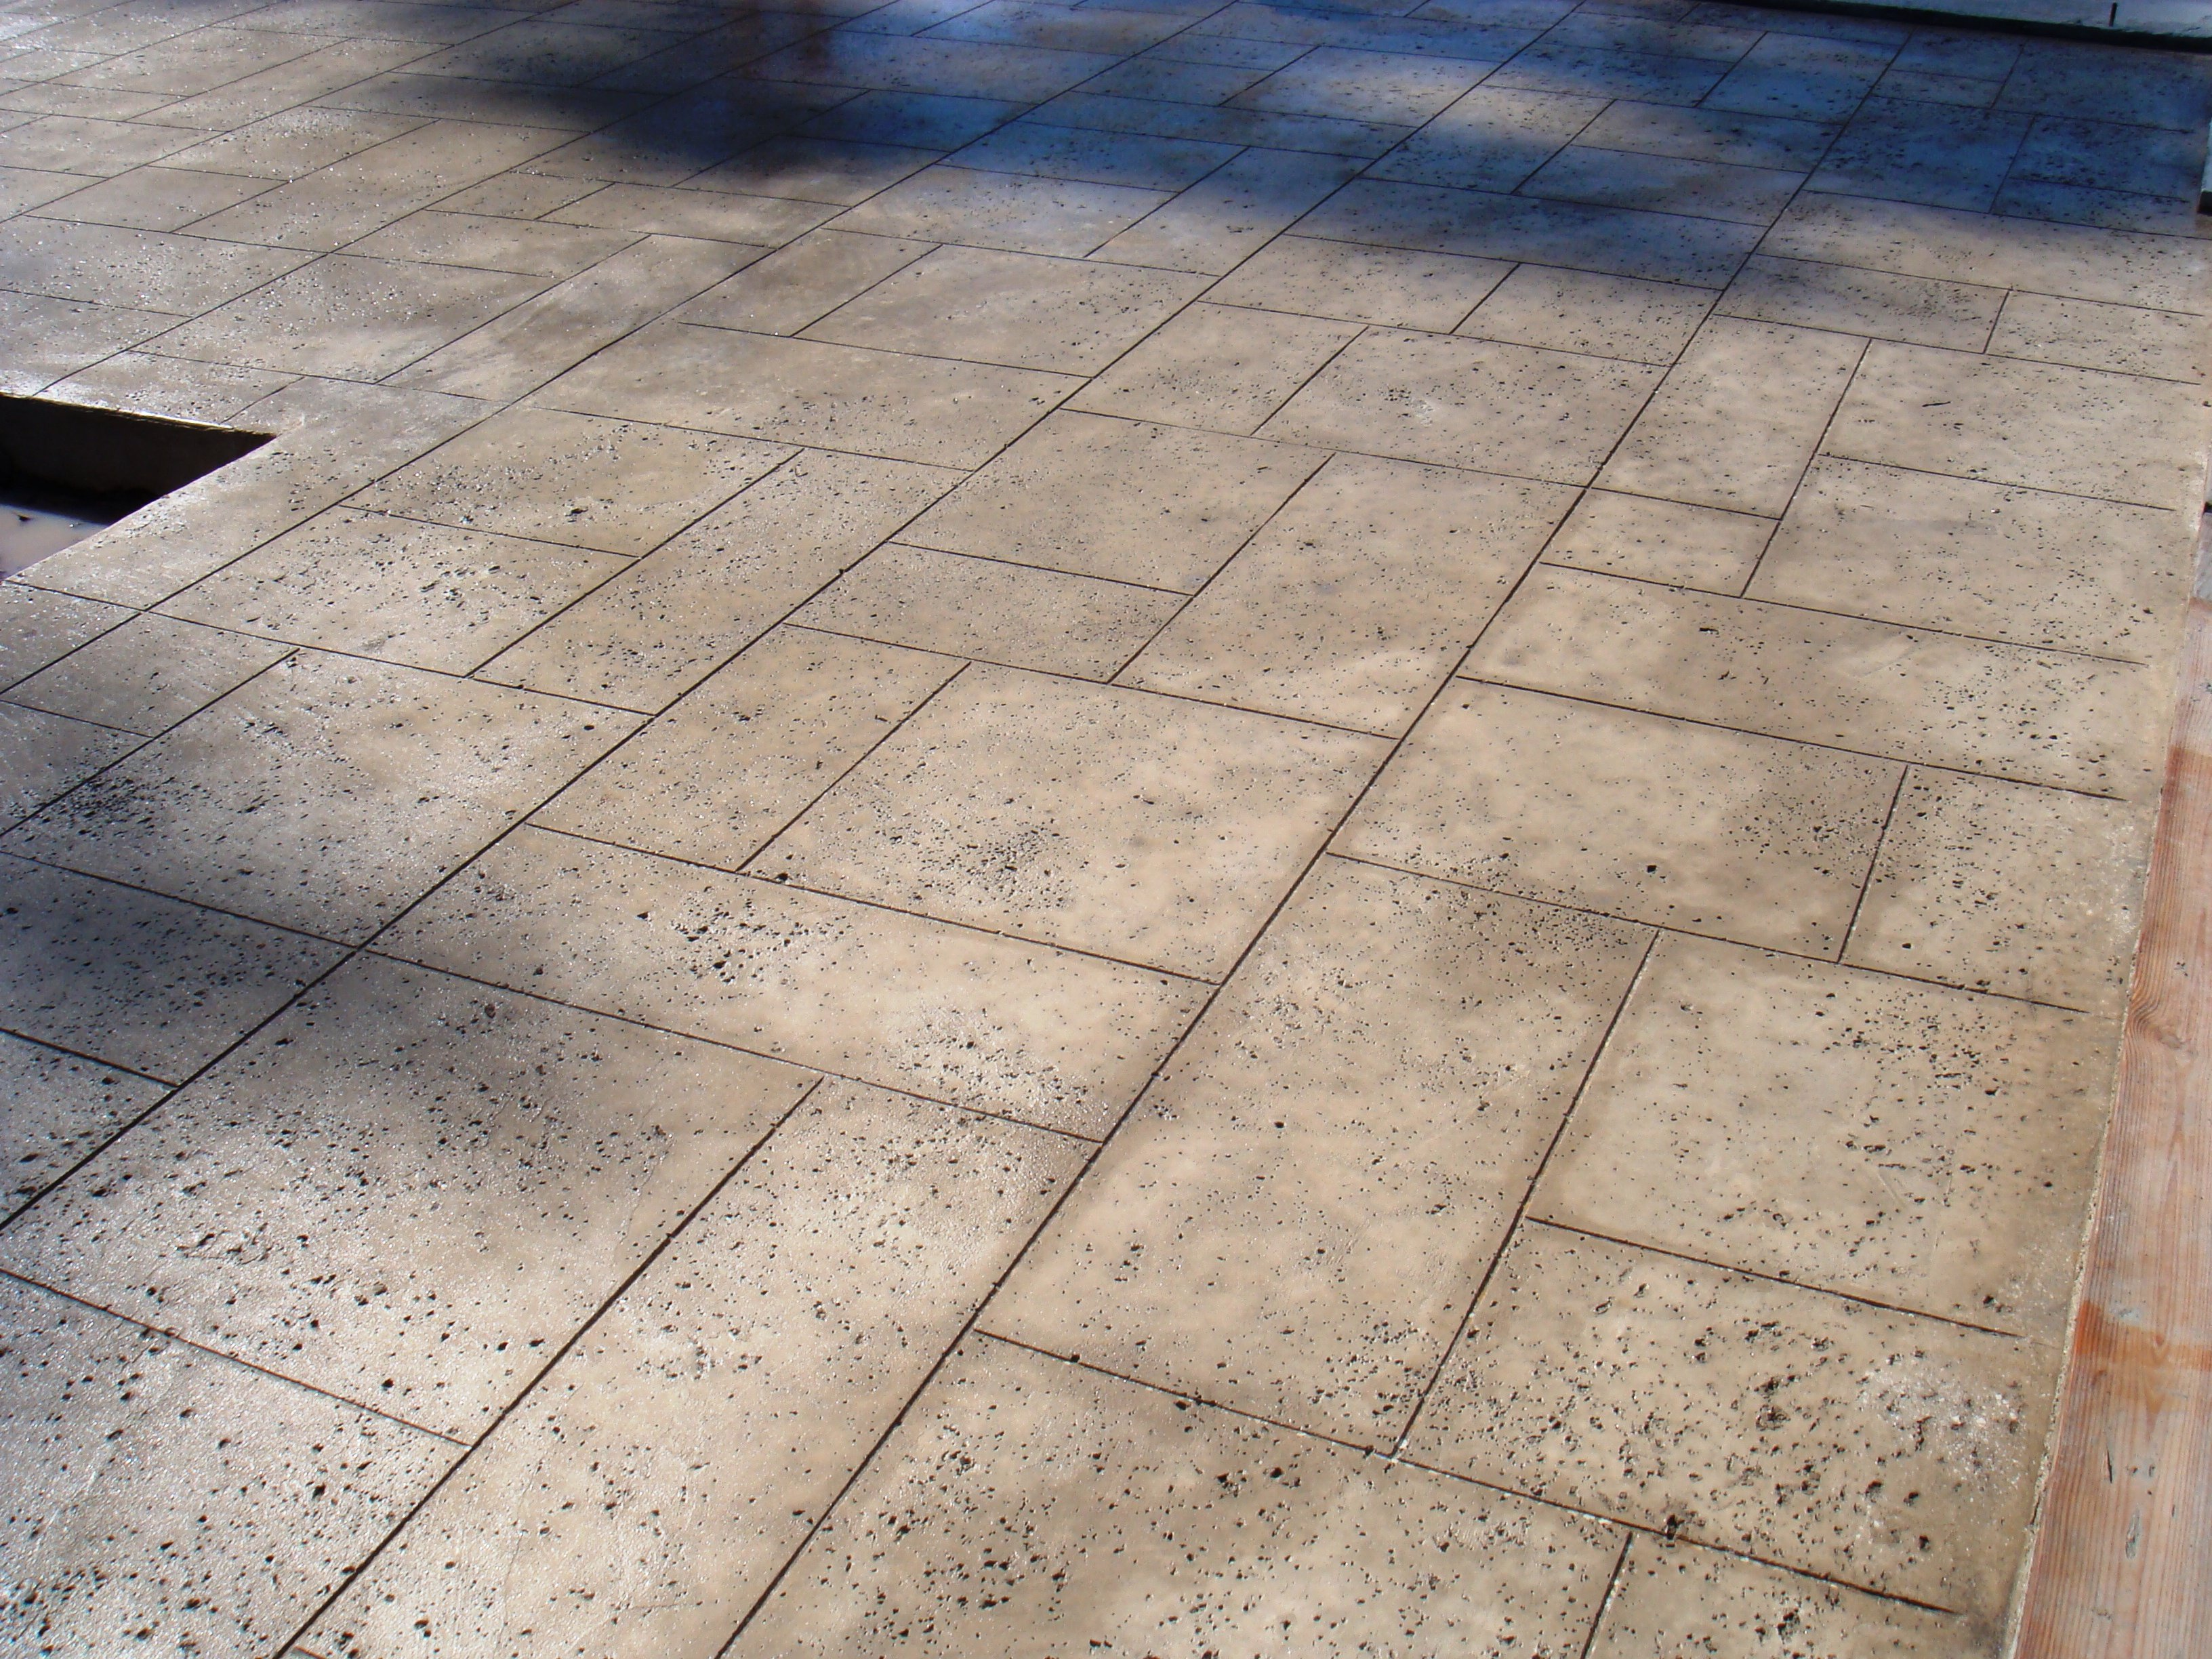 outdoor patio epoxy coating in syracuse